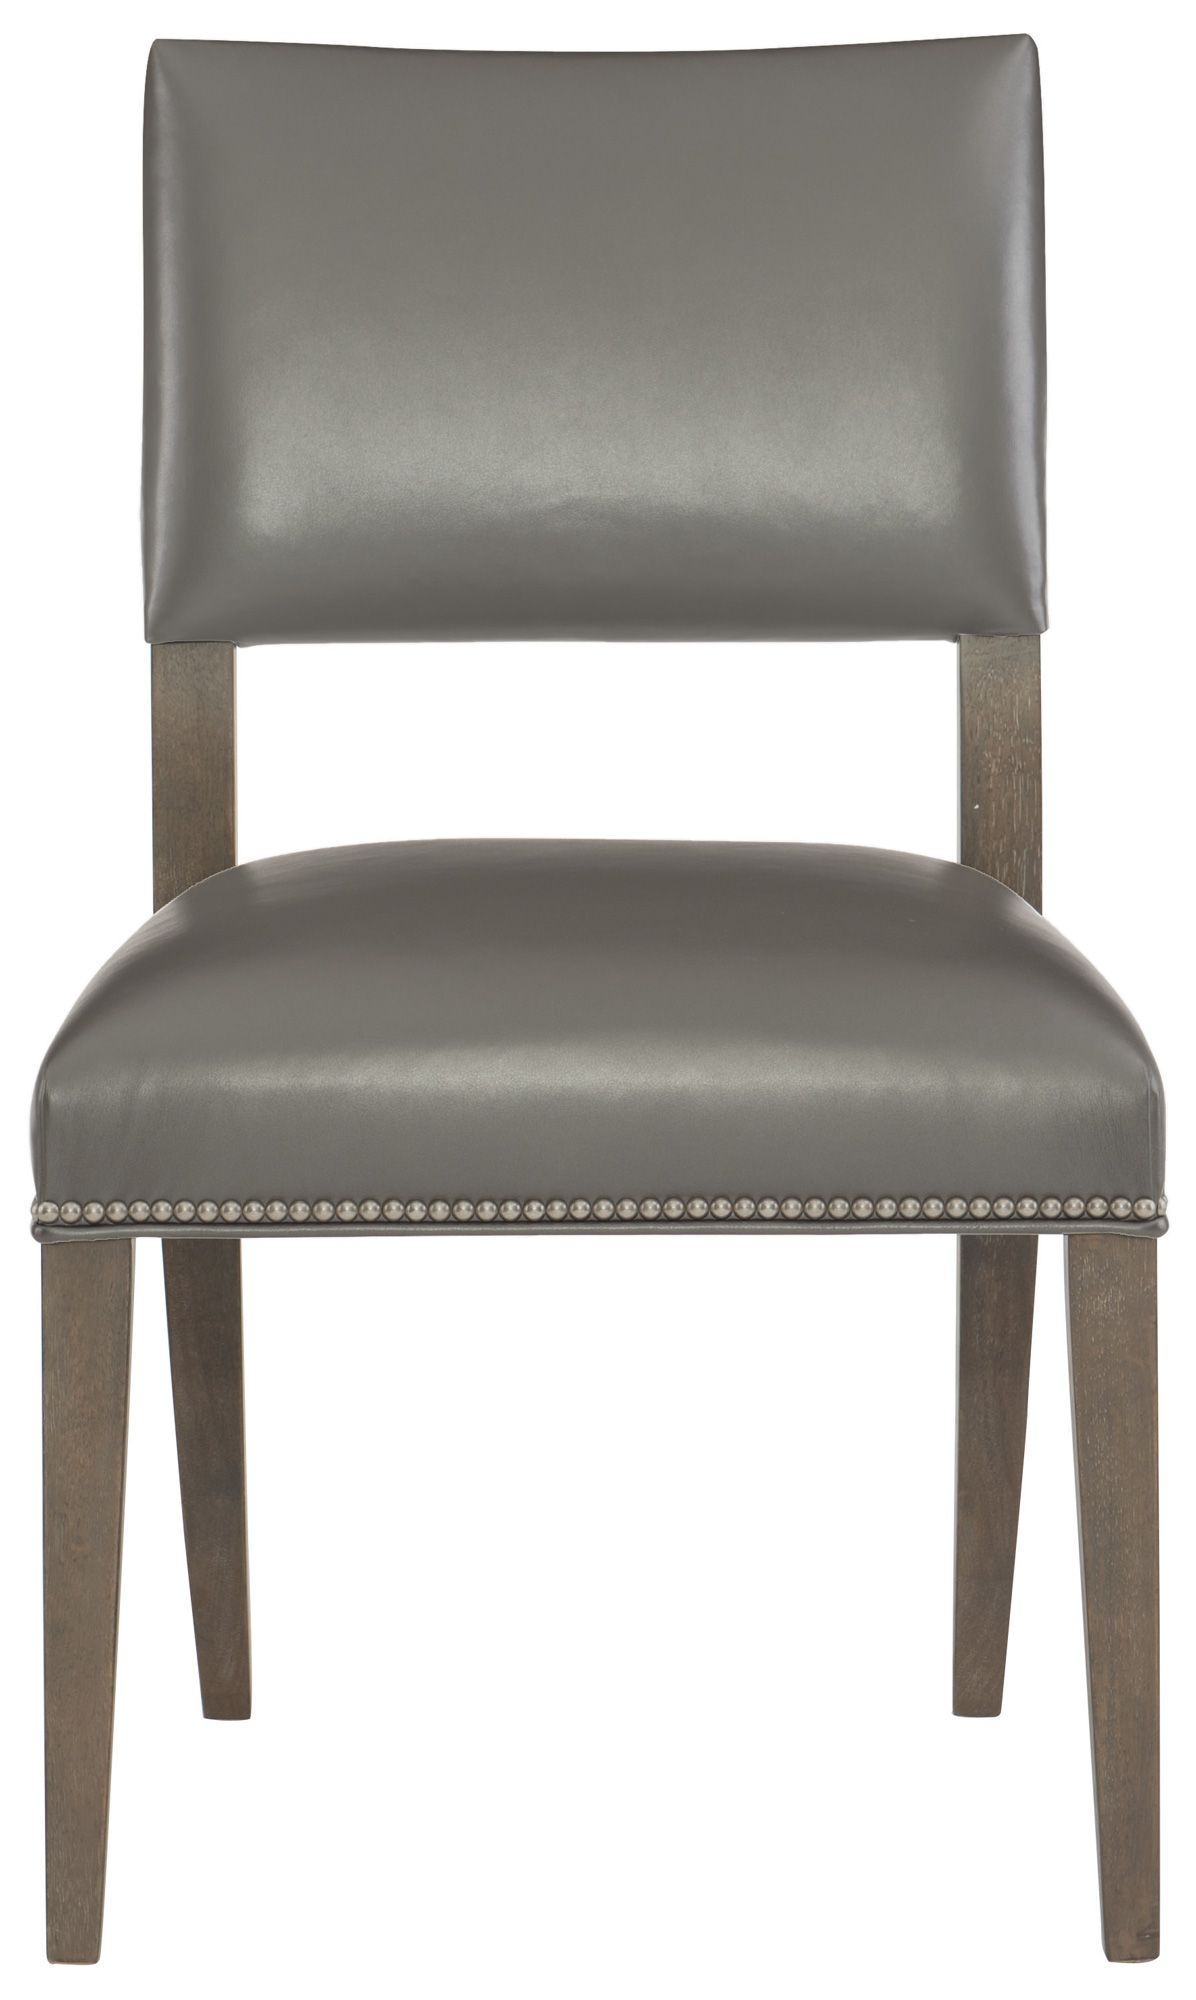 Leather Side Chair Bernhardt Savo Pinterest Chair Side